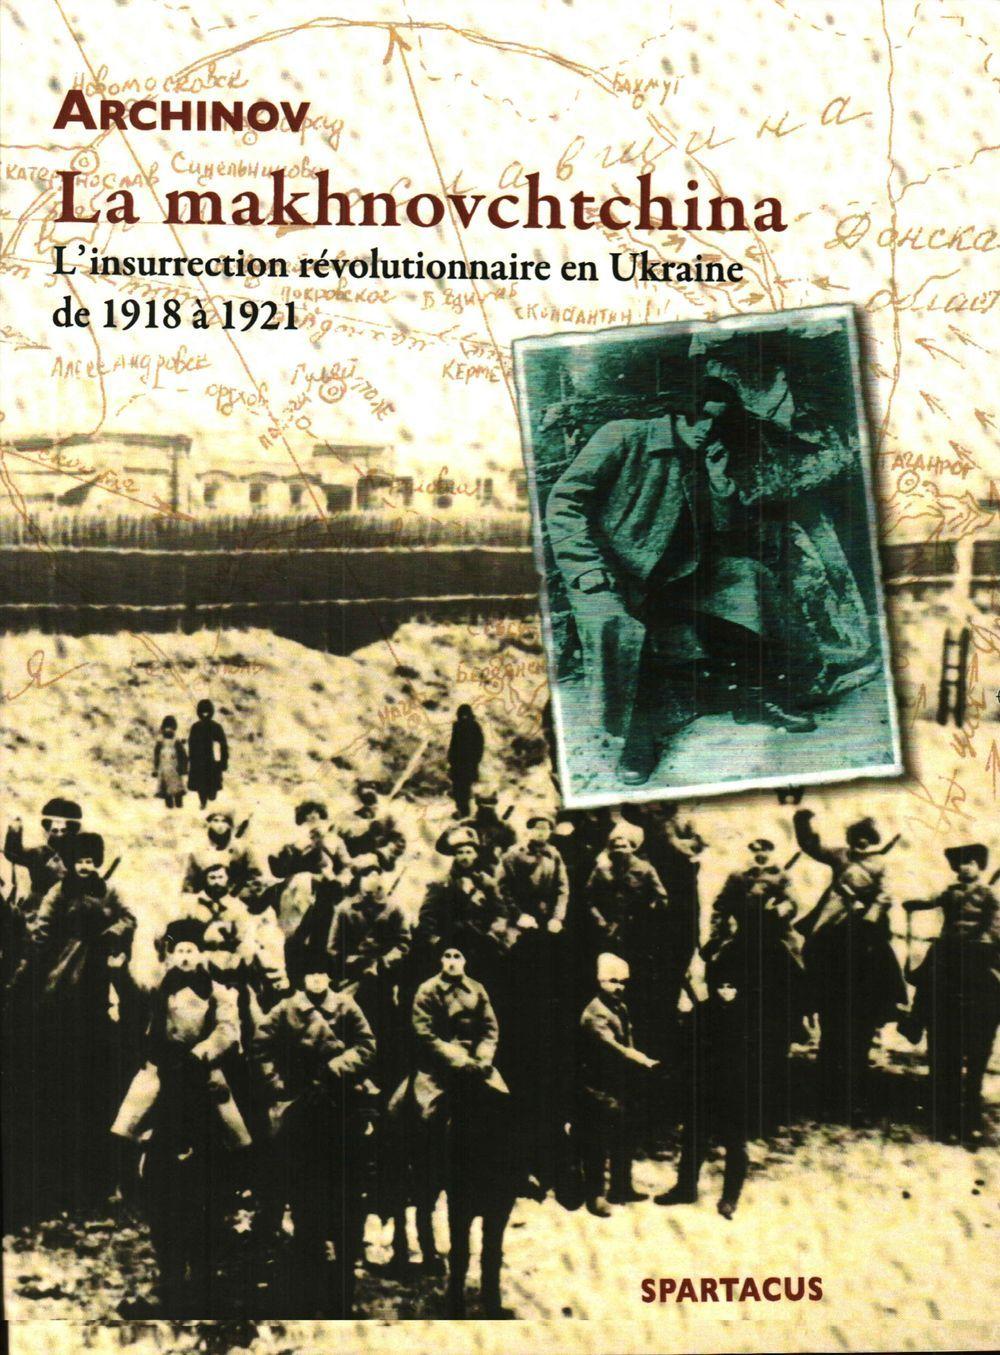 LA MAKHNOVCHTCHINA